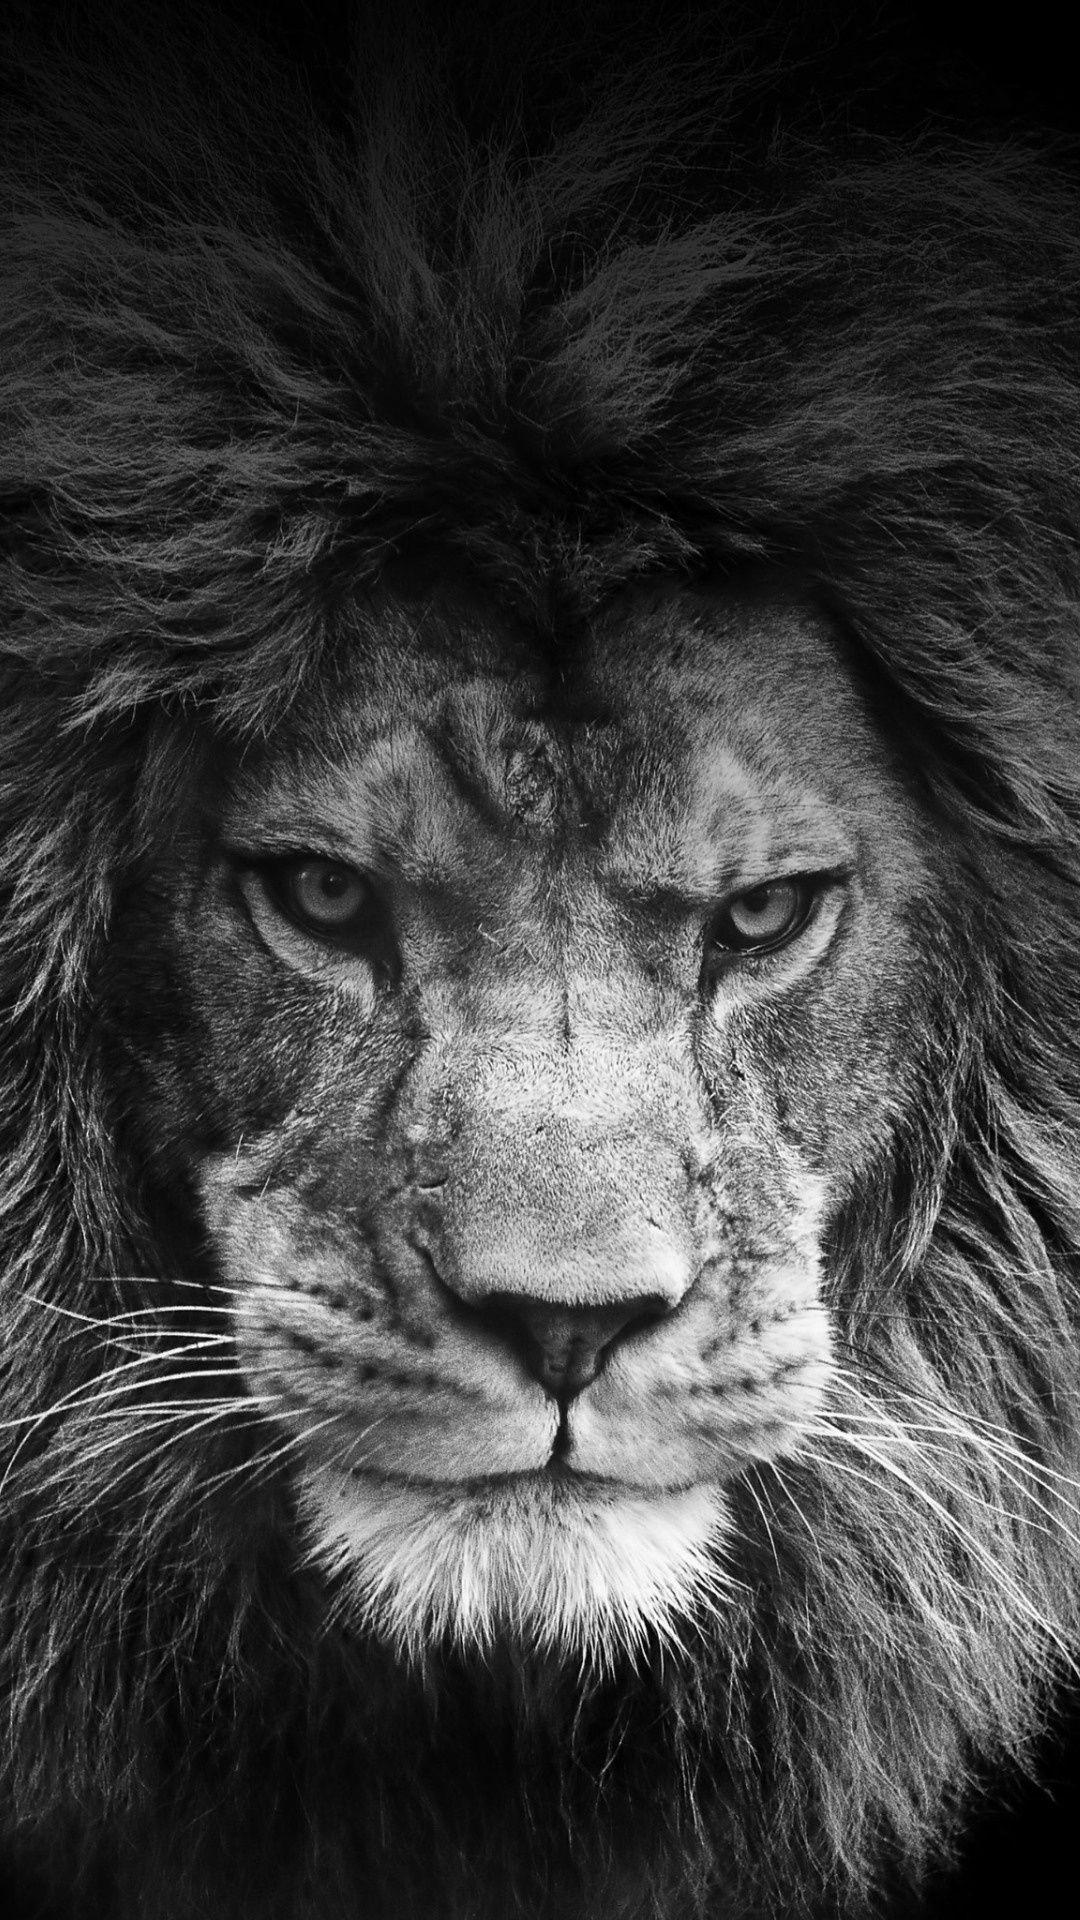 Find Out Legendary Lion Wallpaper On Hdpicorner Com Legendary